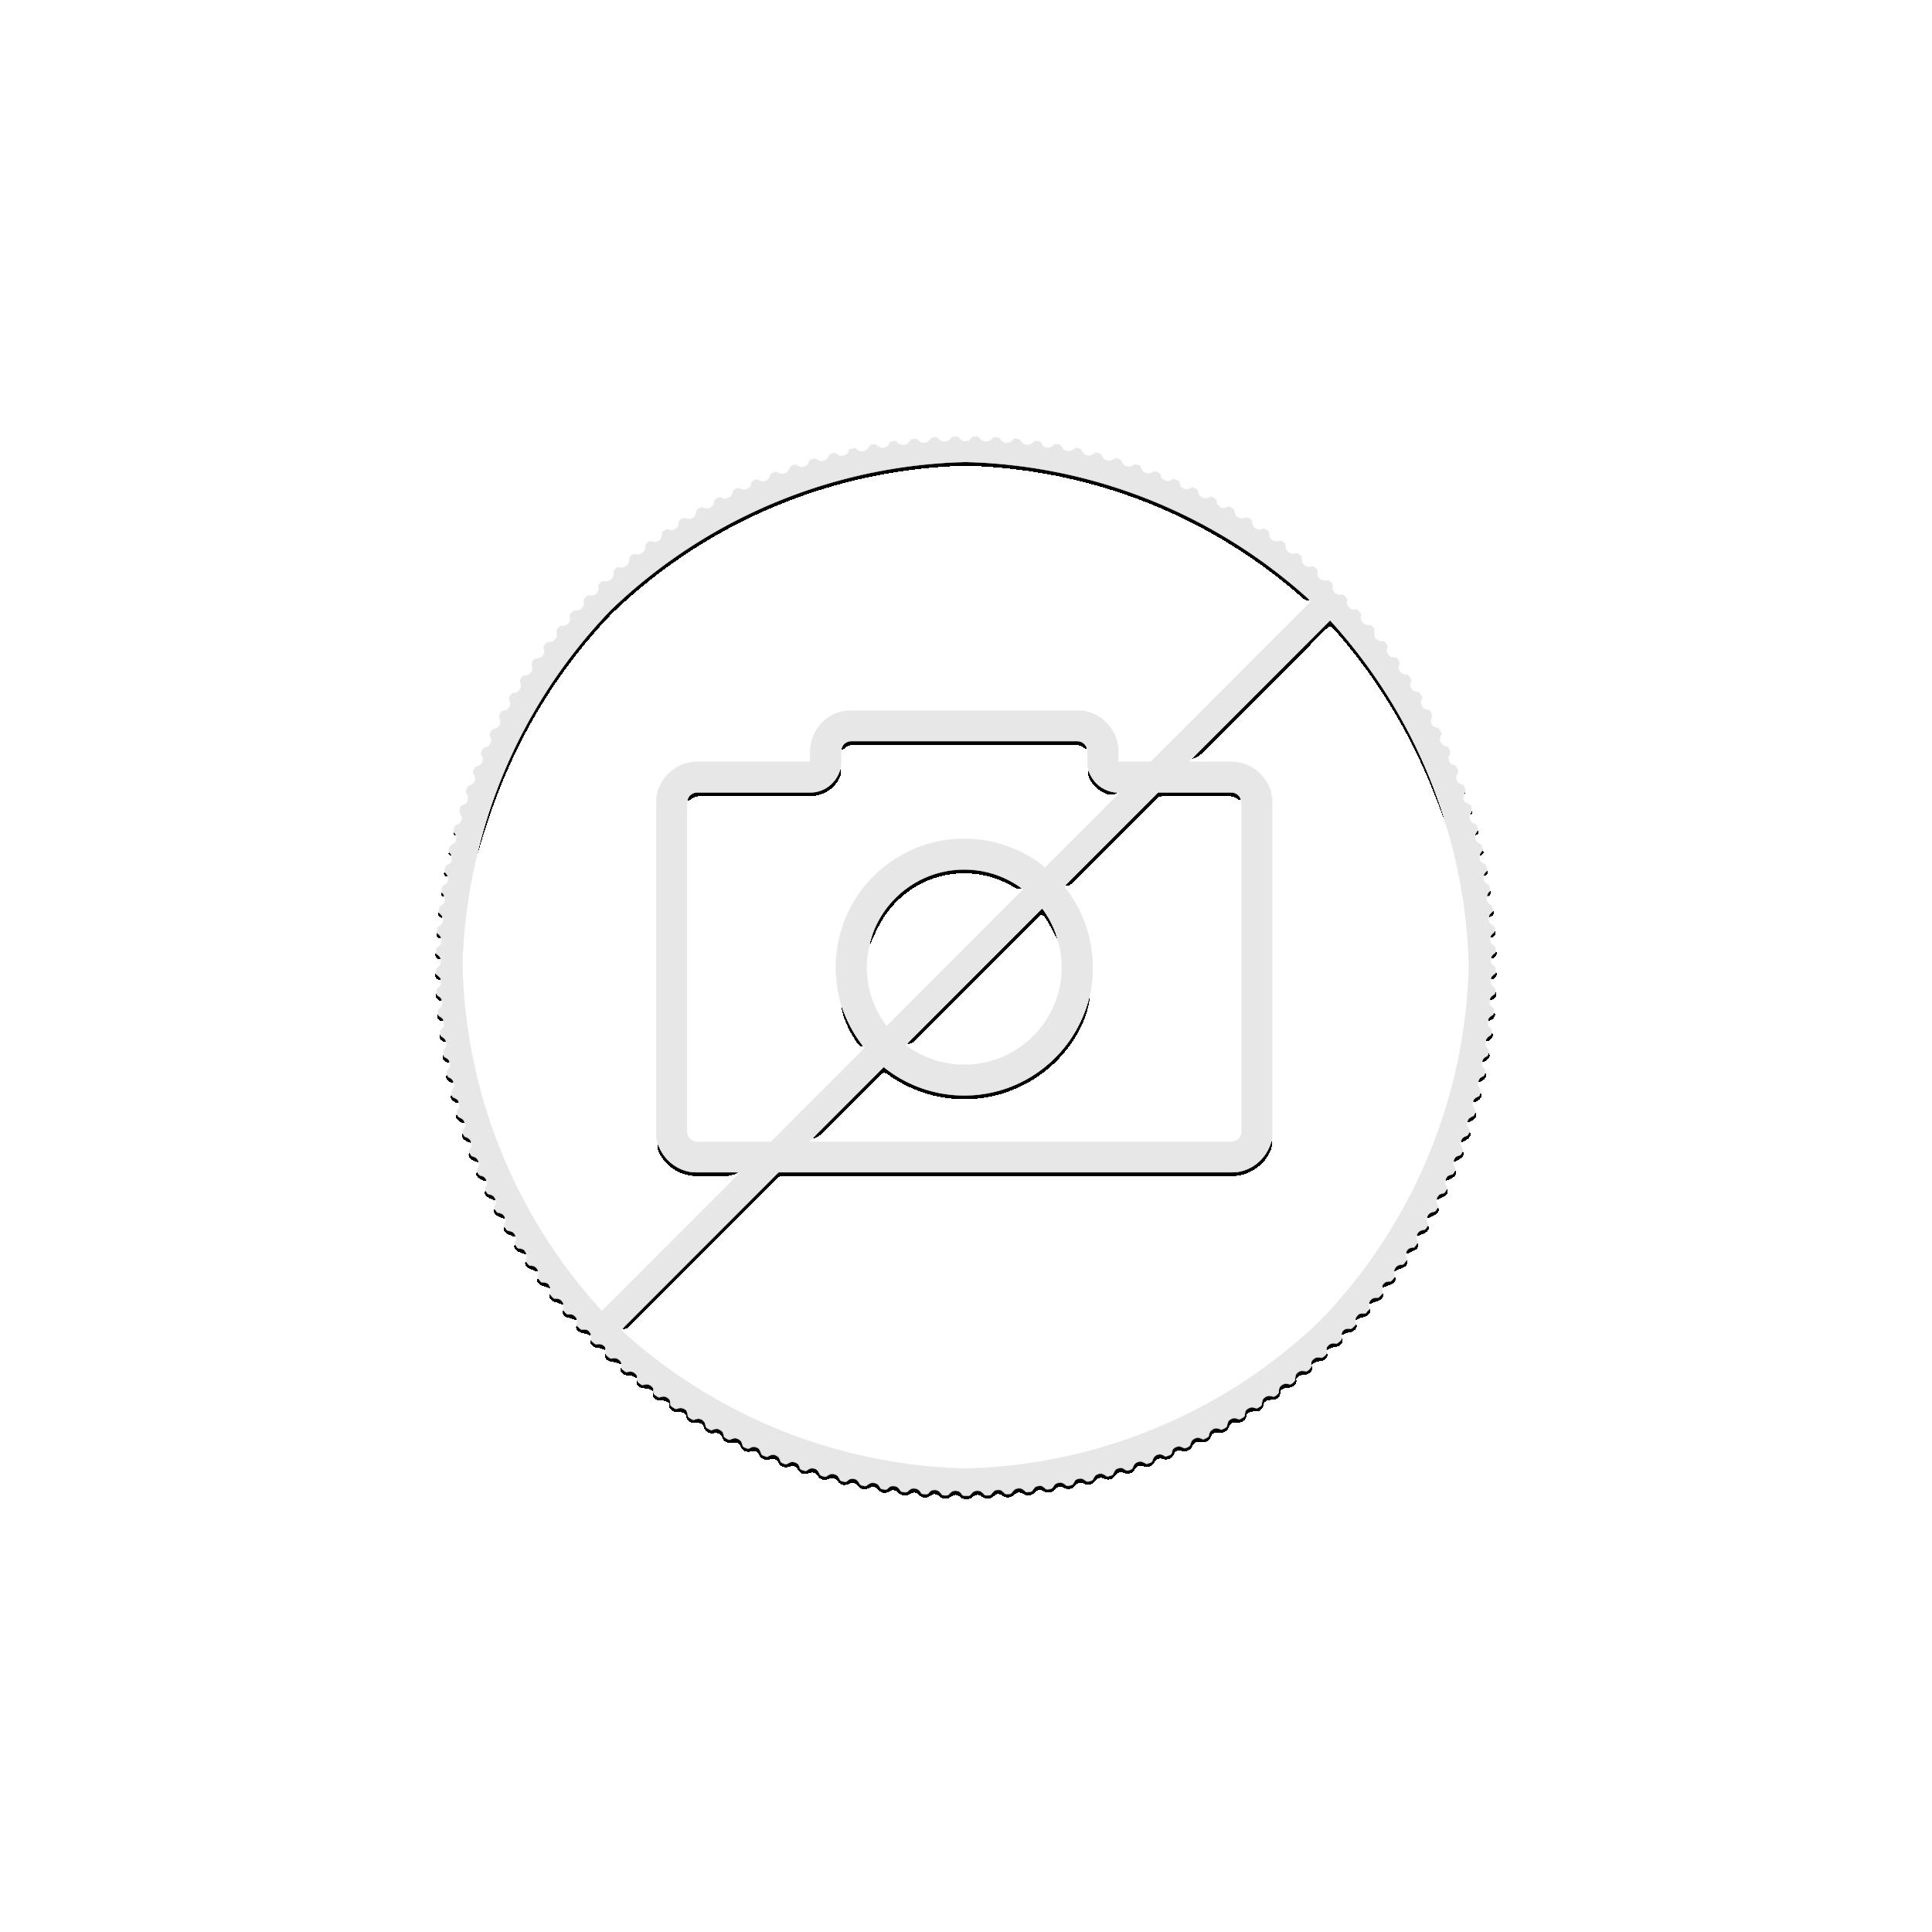 1 Troy ounce gouden Maple Leaf munt 2021